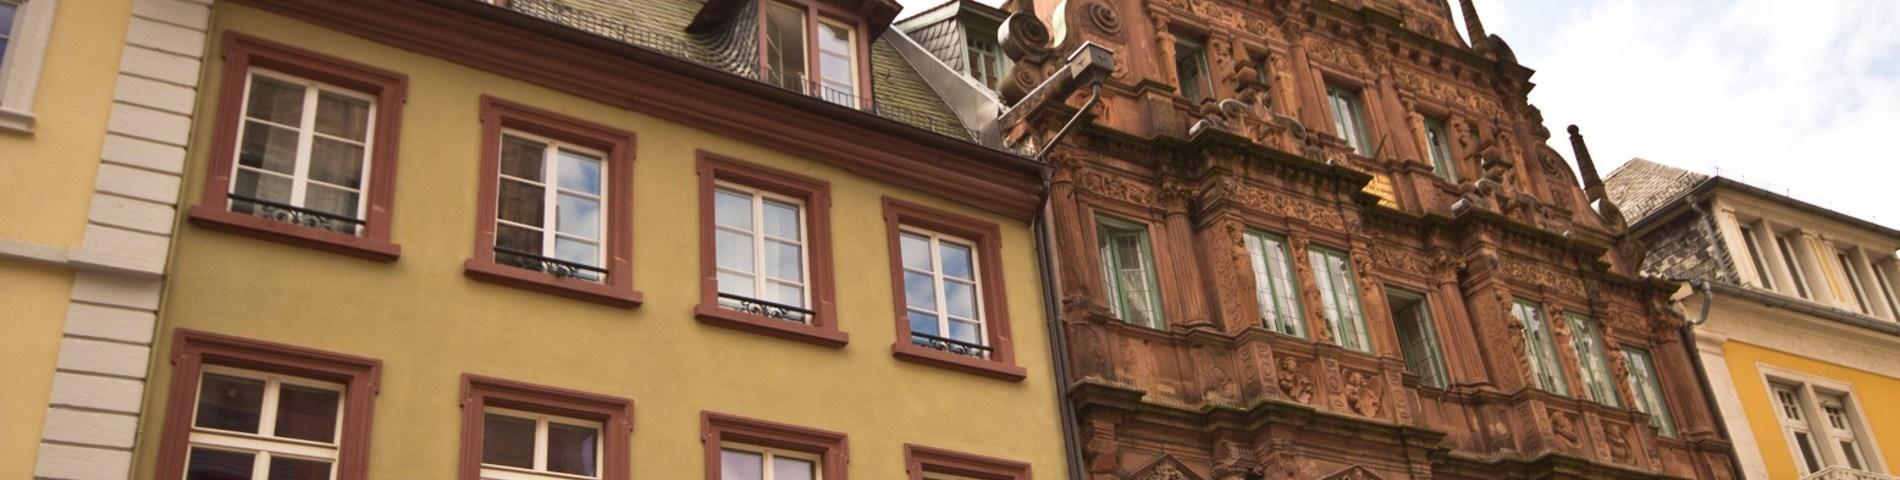 F+U Academy of Languages Heidelberg Language School | 136 Reviews